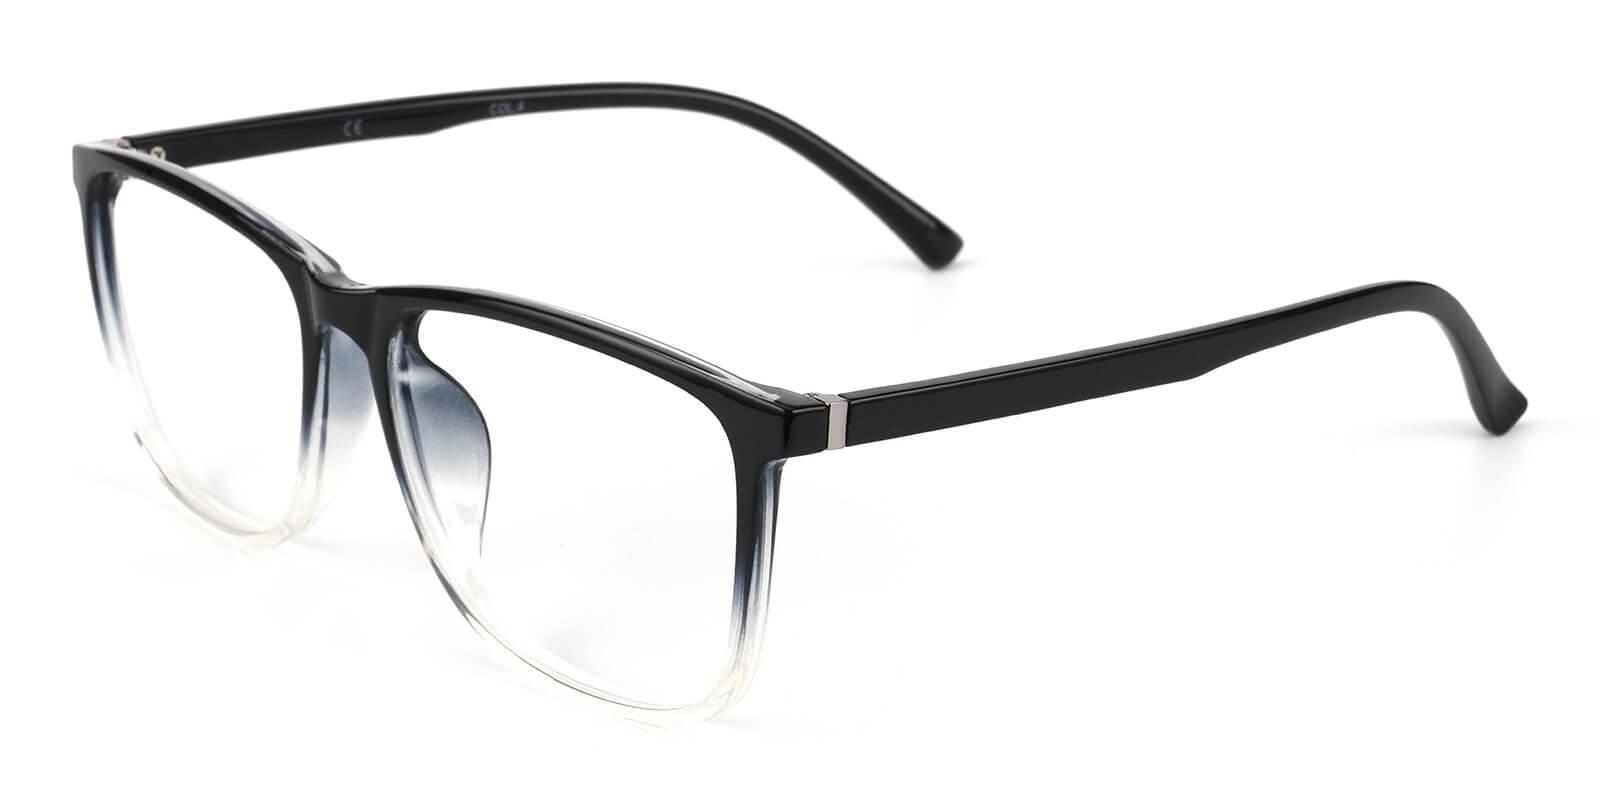 Poise-Black-Square-TR-Eyeglasses-additional1